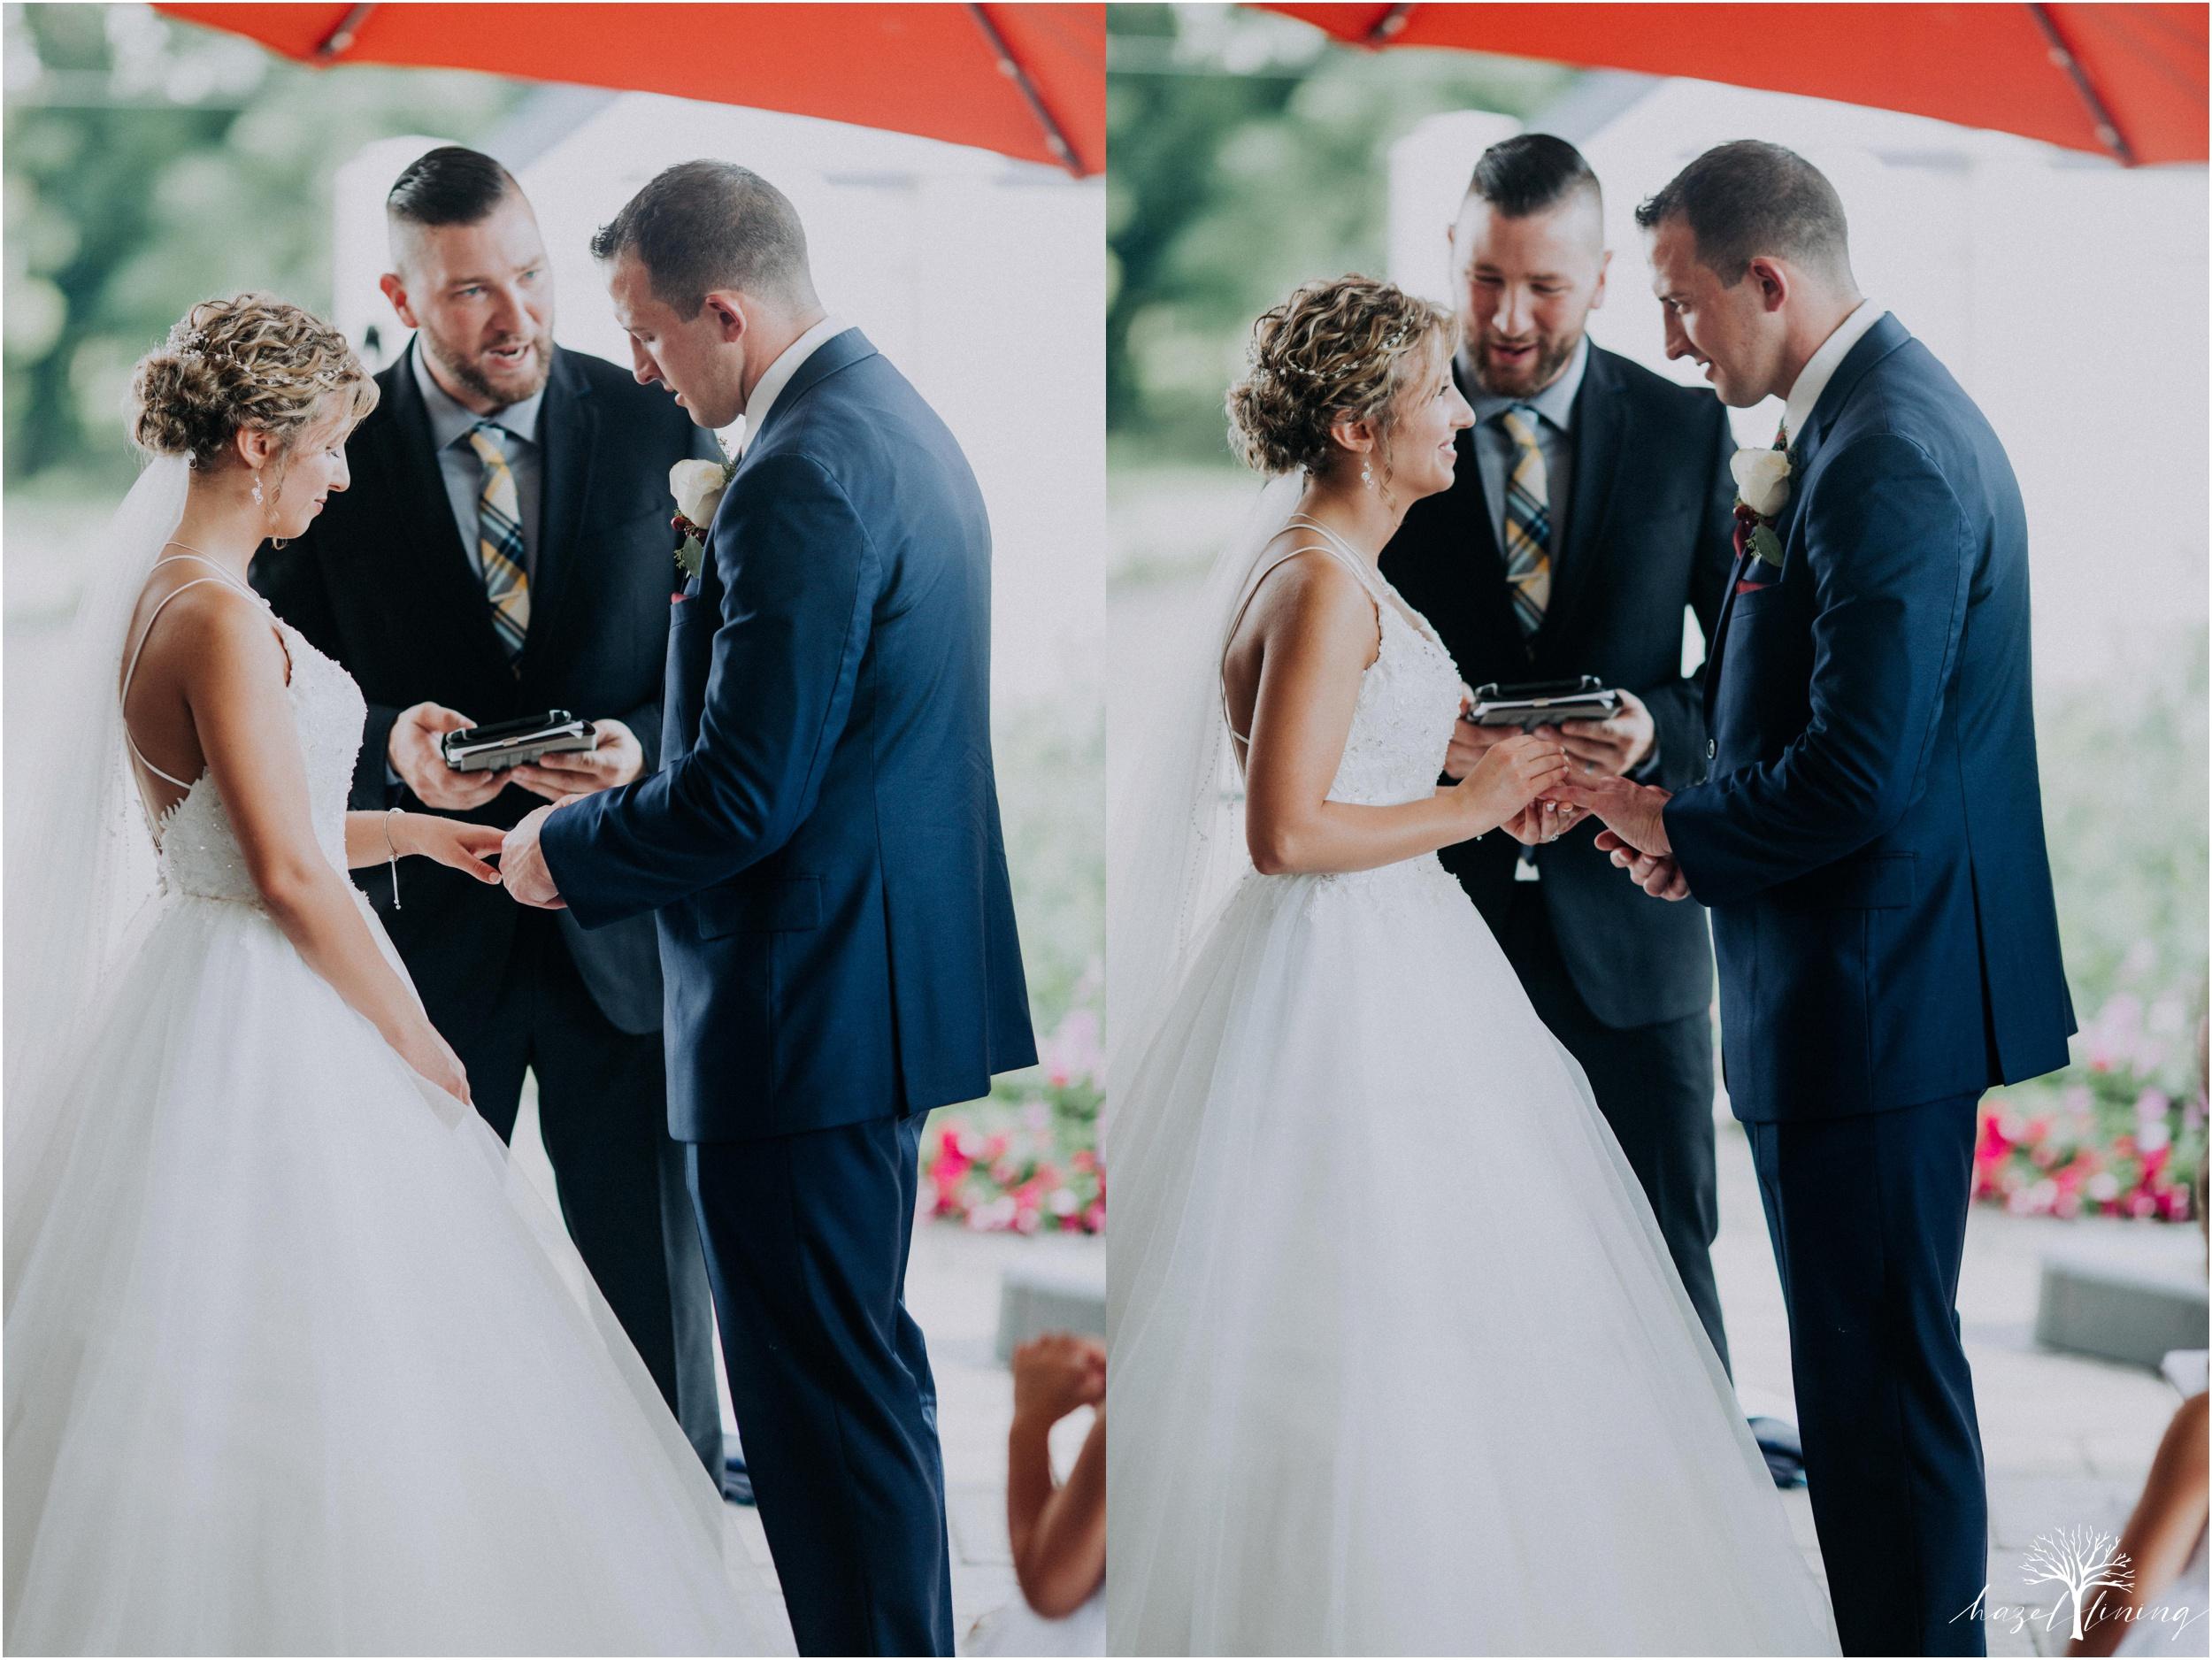 jonathan-weibel-becky-haywood-loft-at-sweetwater-cc-pennsburg-pennsylvania-rainy-day-summer-wedding-hazel-lining-travel-wedding-elopement-photography_0048.jpg